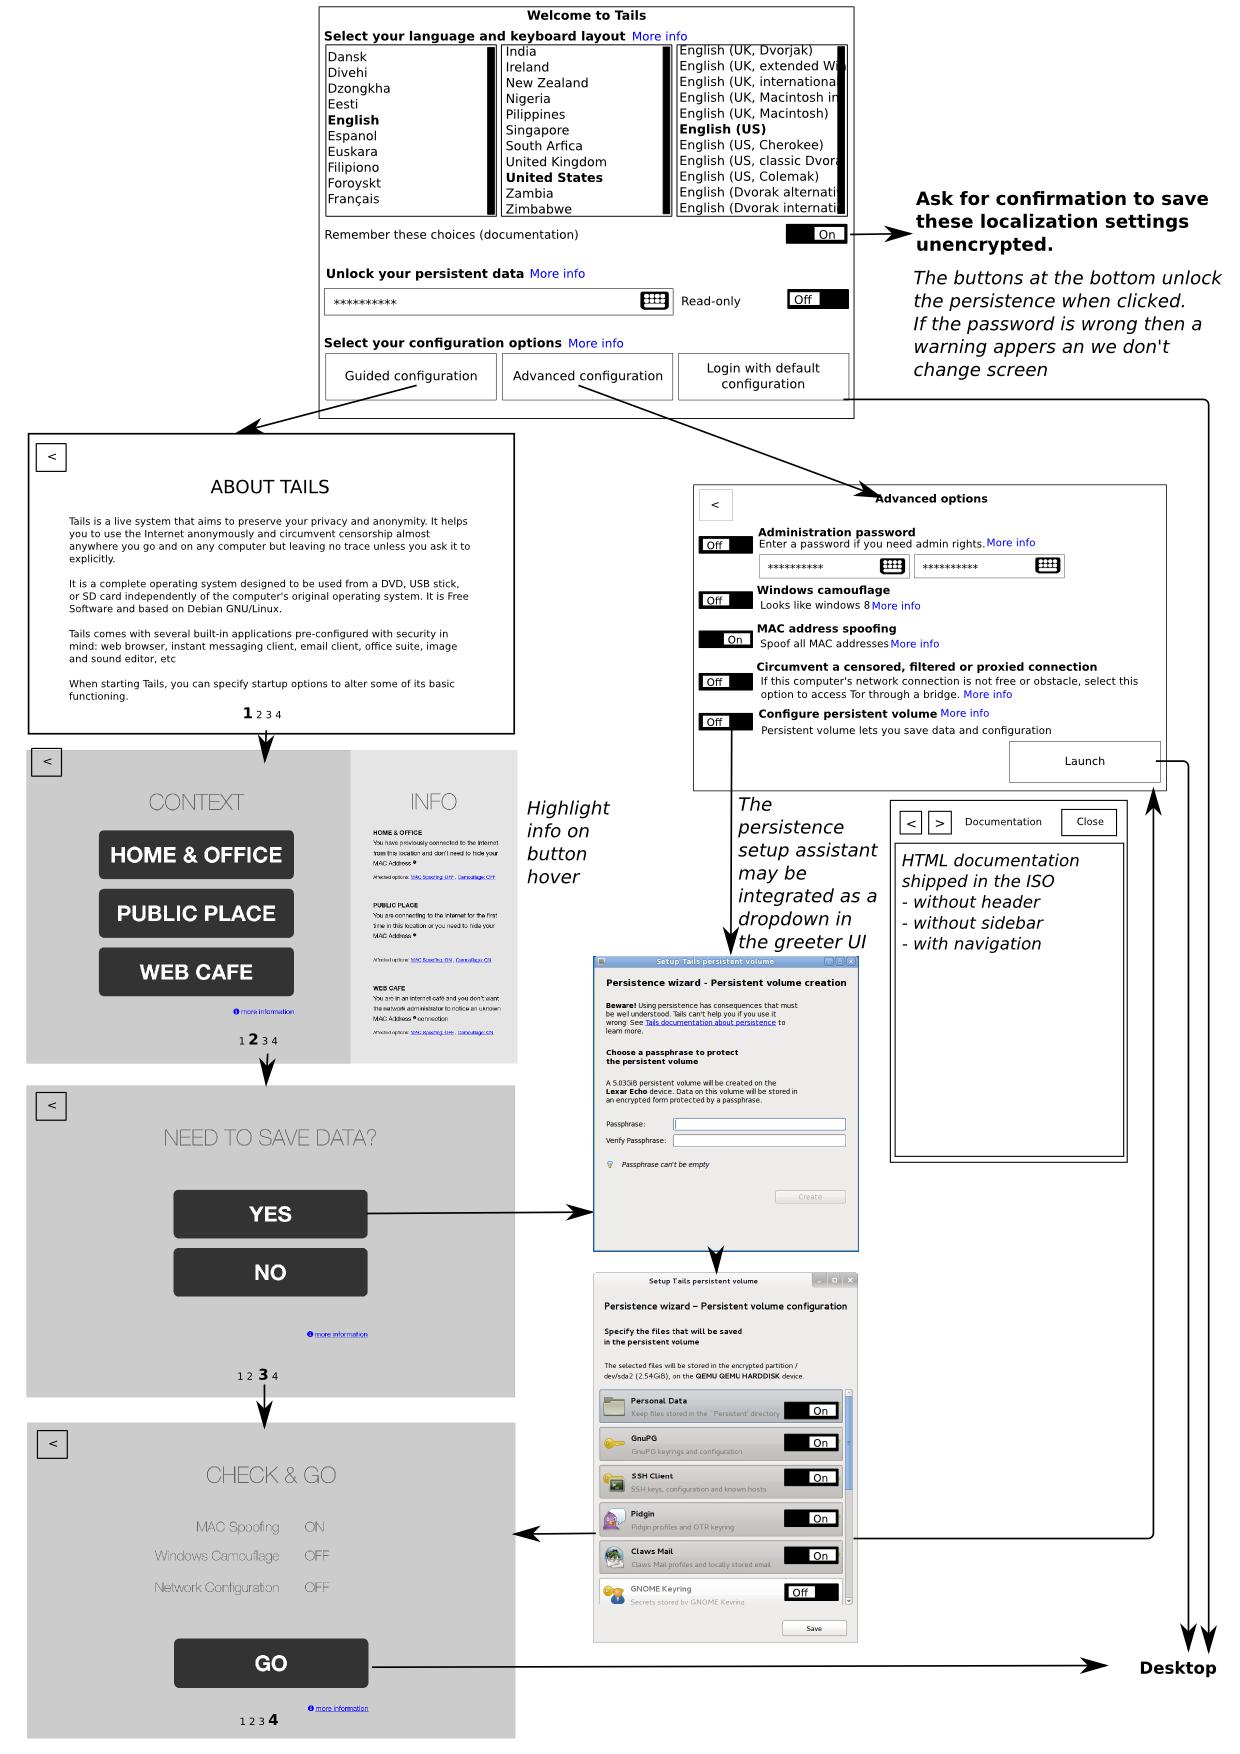 wiki/src/blueprint/tails-greeter:_revamp_UI/greeter-flow.png